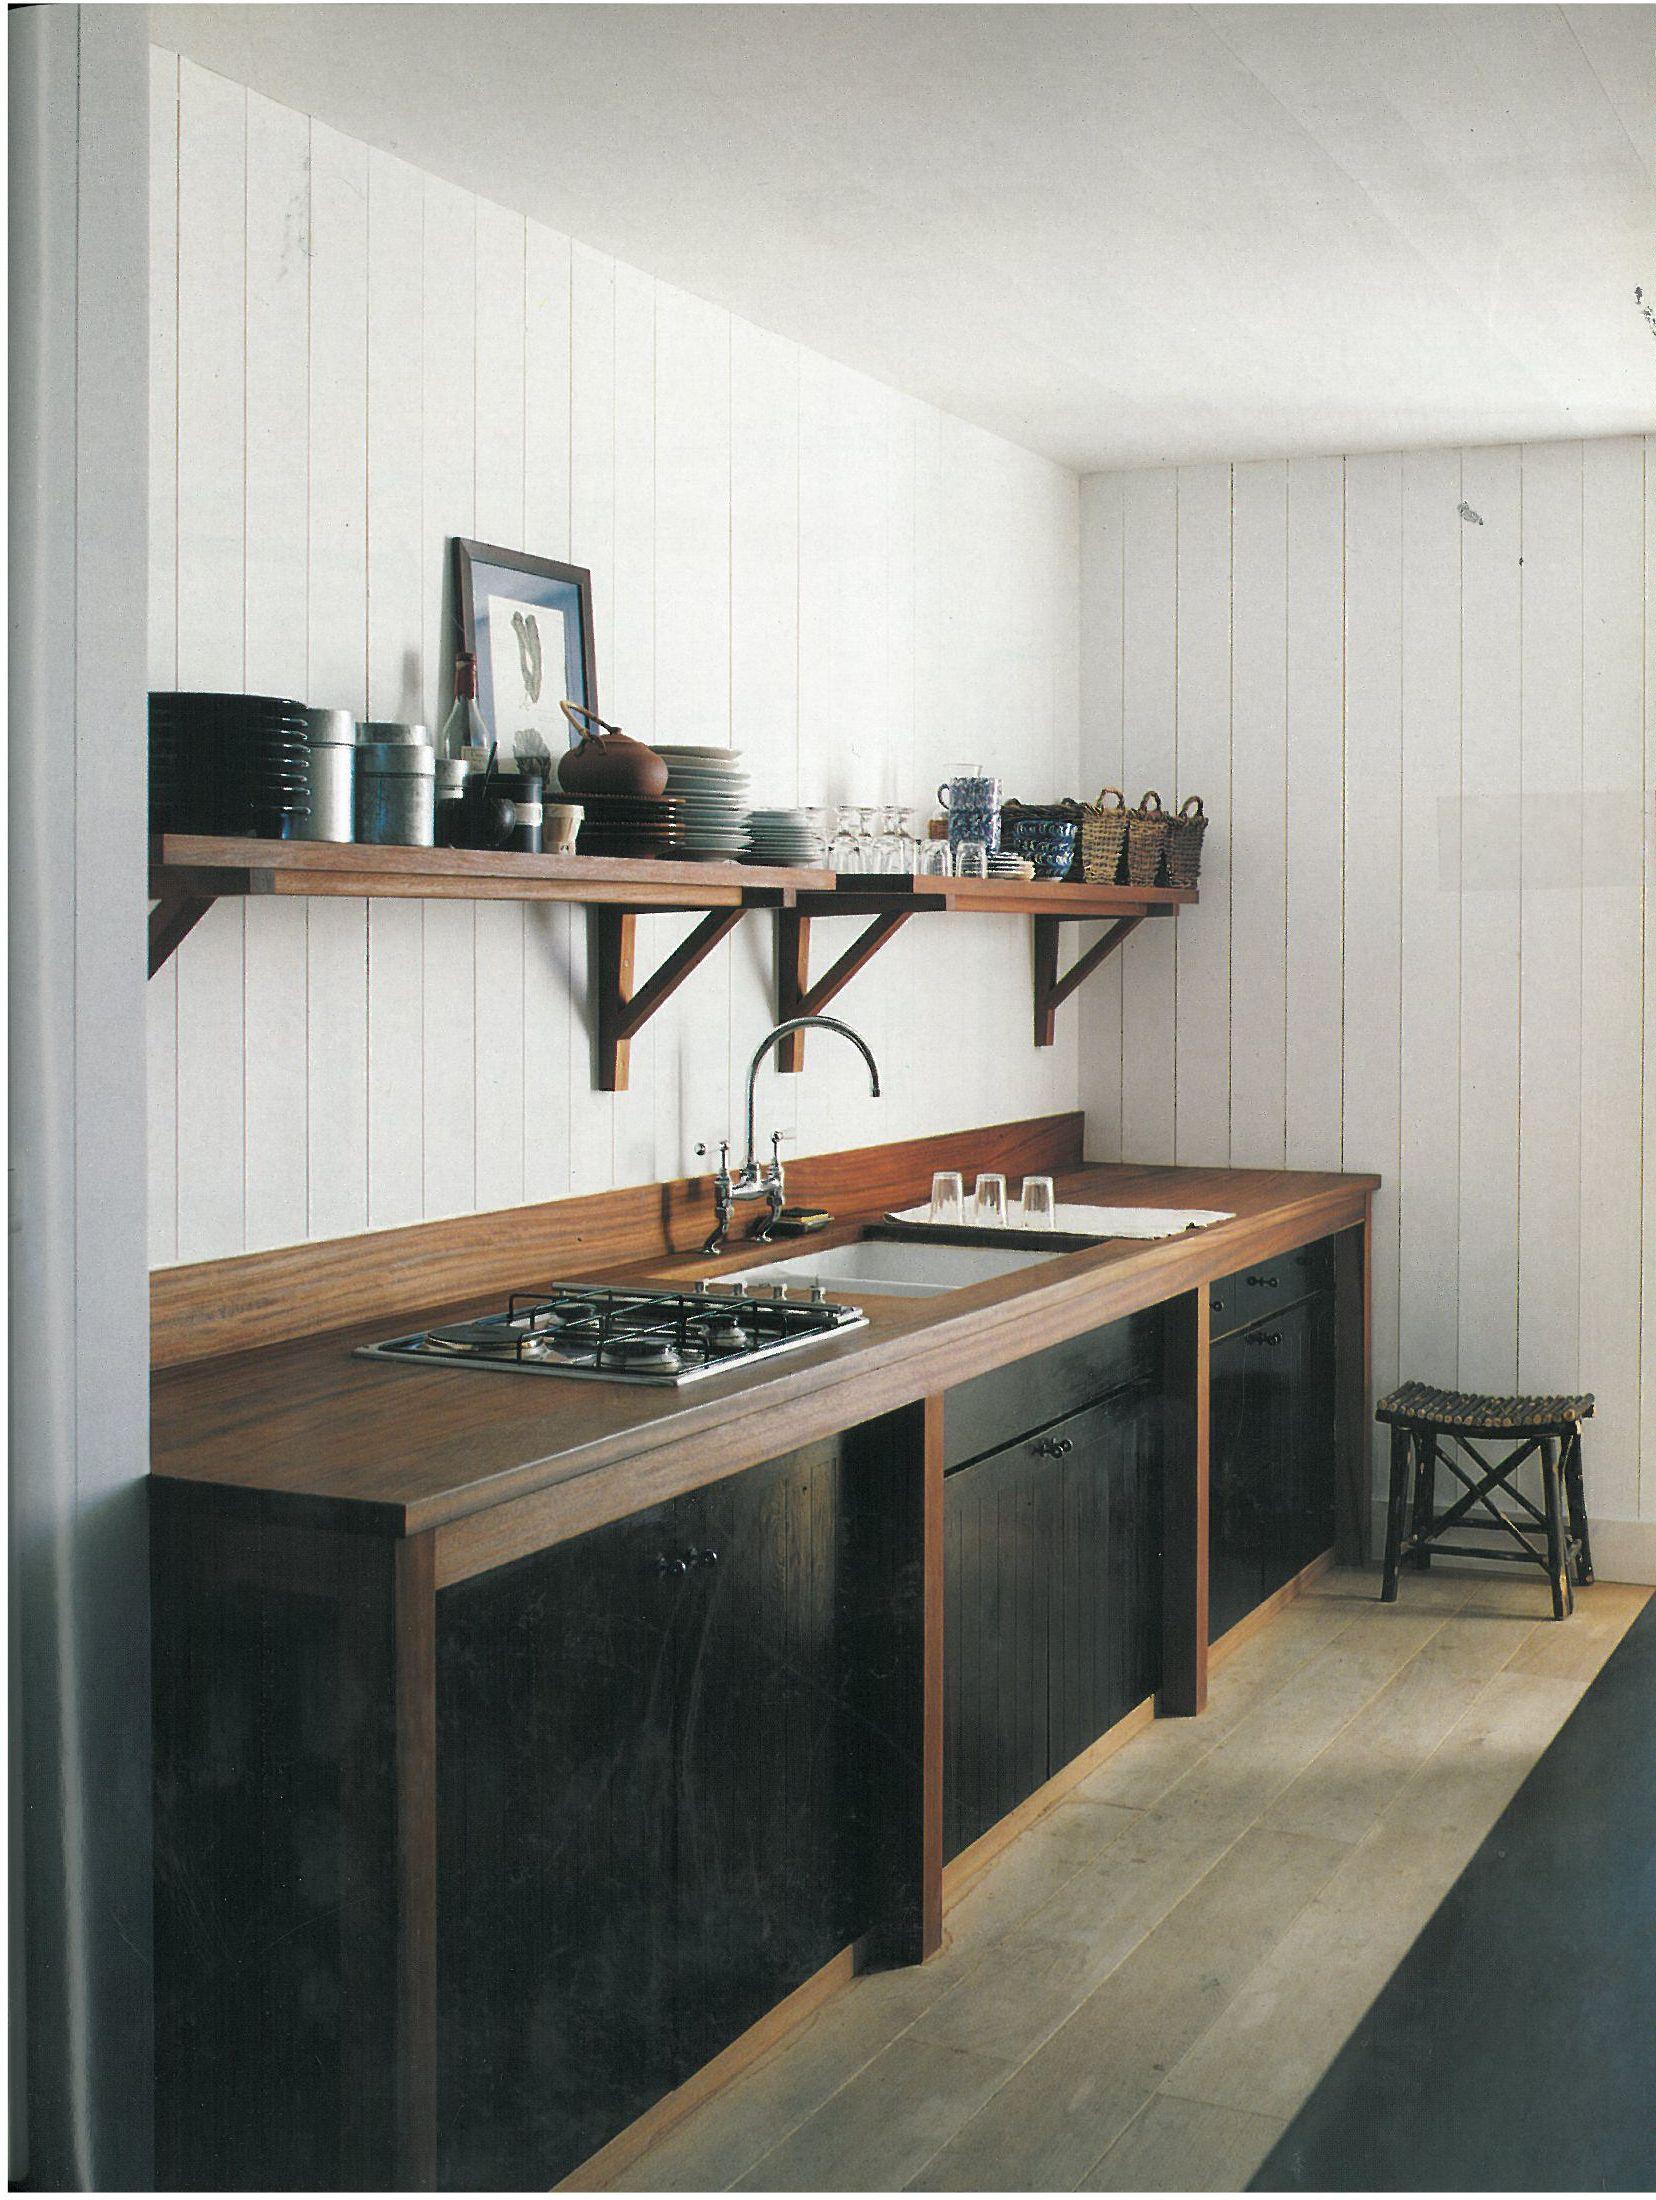 Basic kitchen cabinets  Black u wood cabinets  rustic kitchen  small furniture  Pinterest